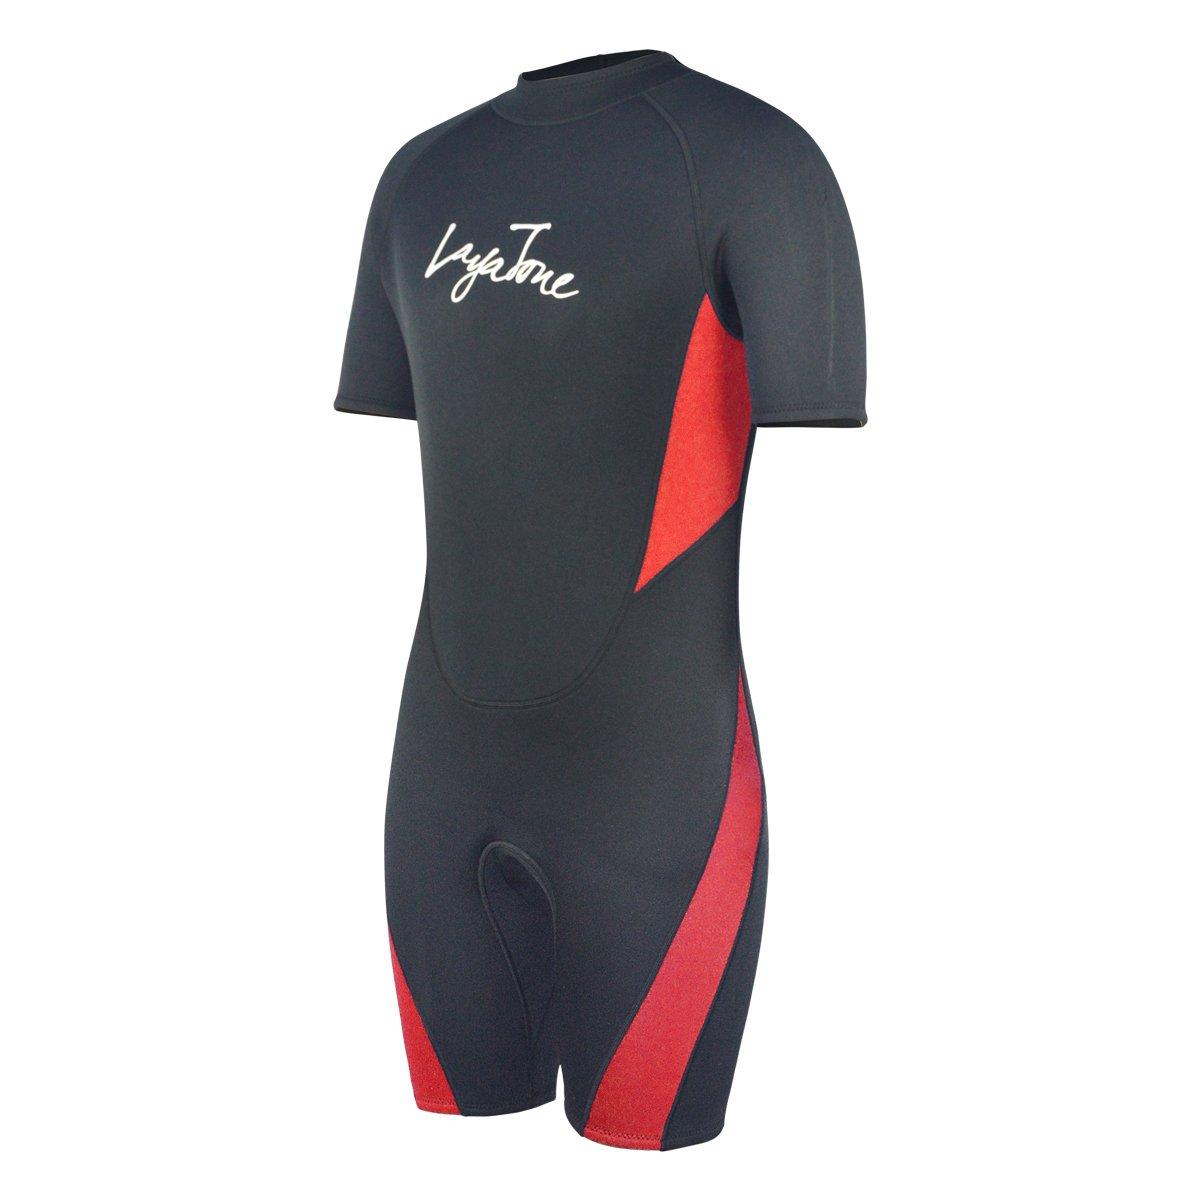 Layatone 3mm Shorty Wetsuit Adults Scuba Diving Suit Men Women Neoprene Wetsuits Thermal One Piece Swimsuit Surf Suit Shorty Suits